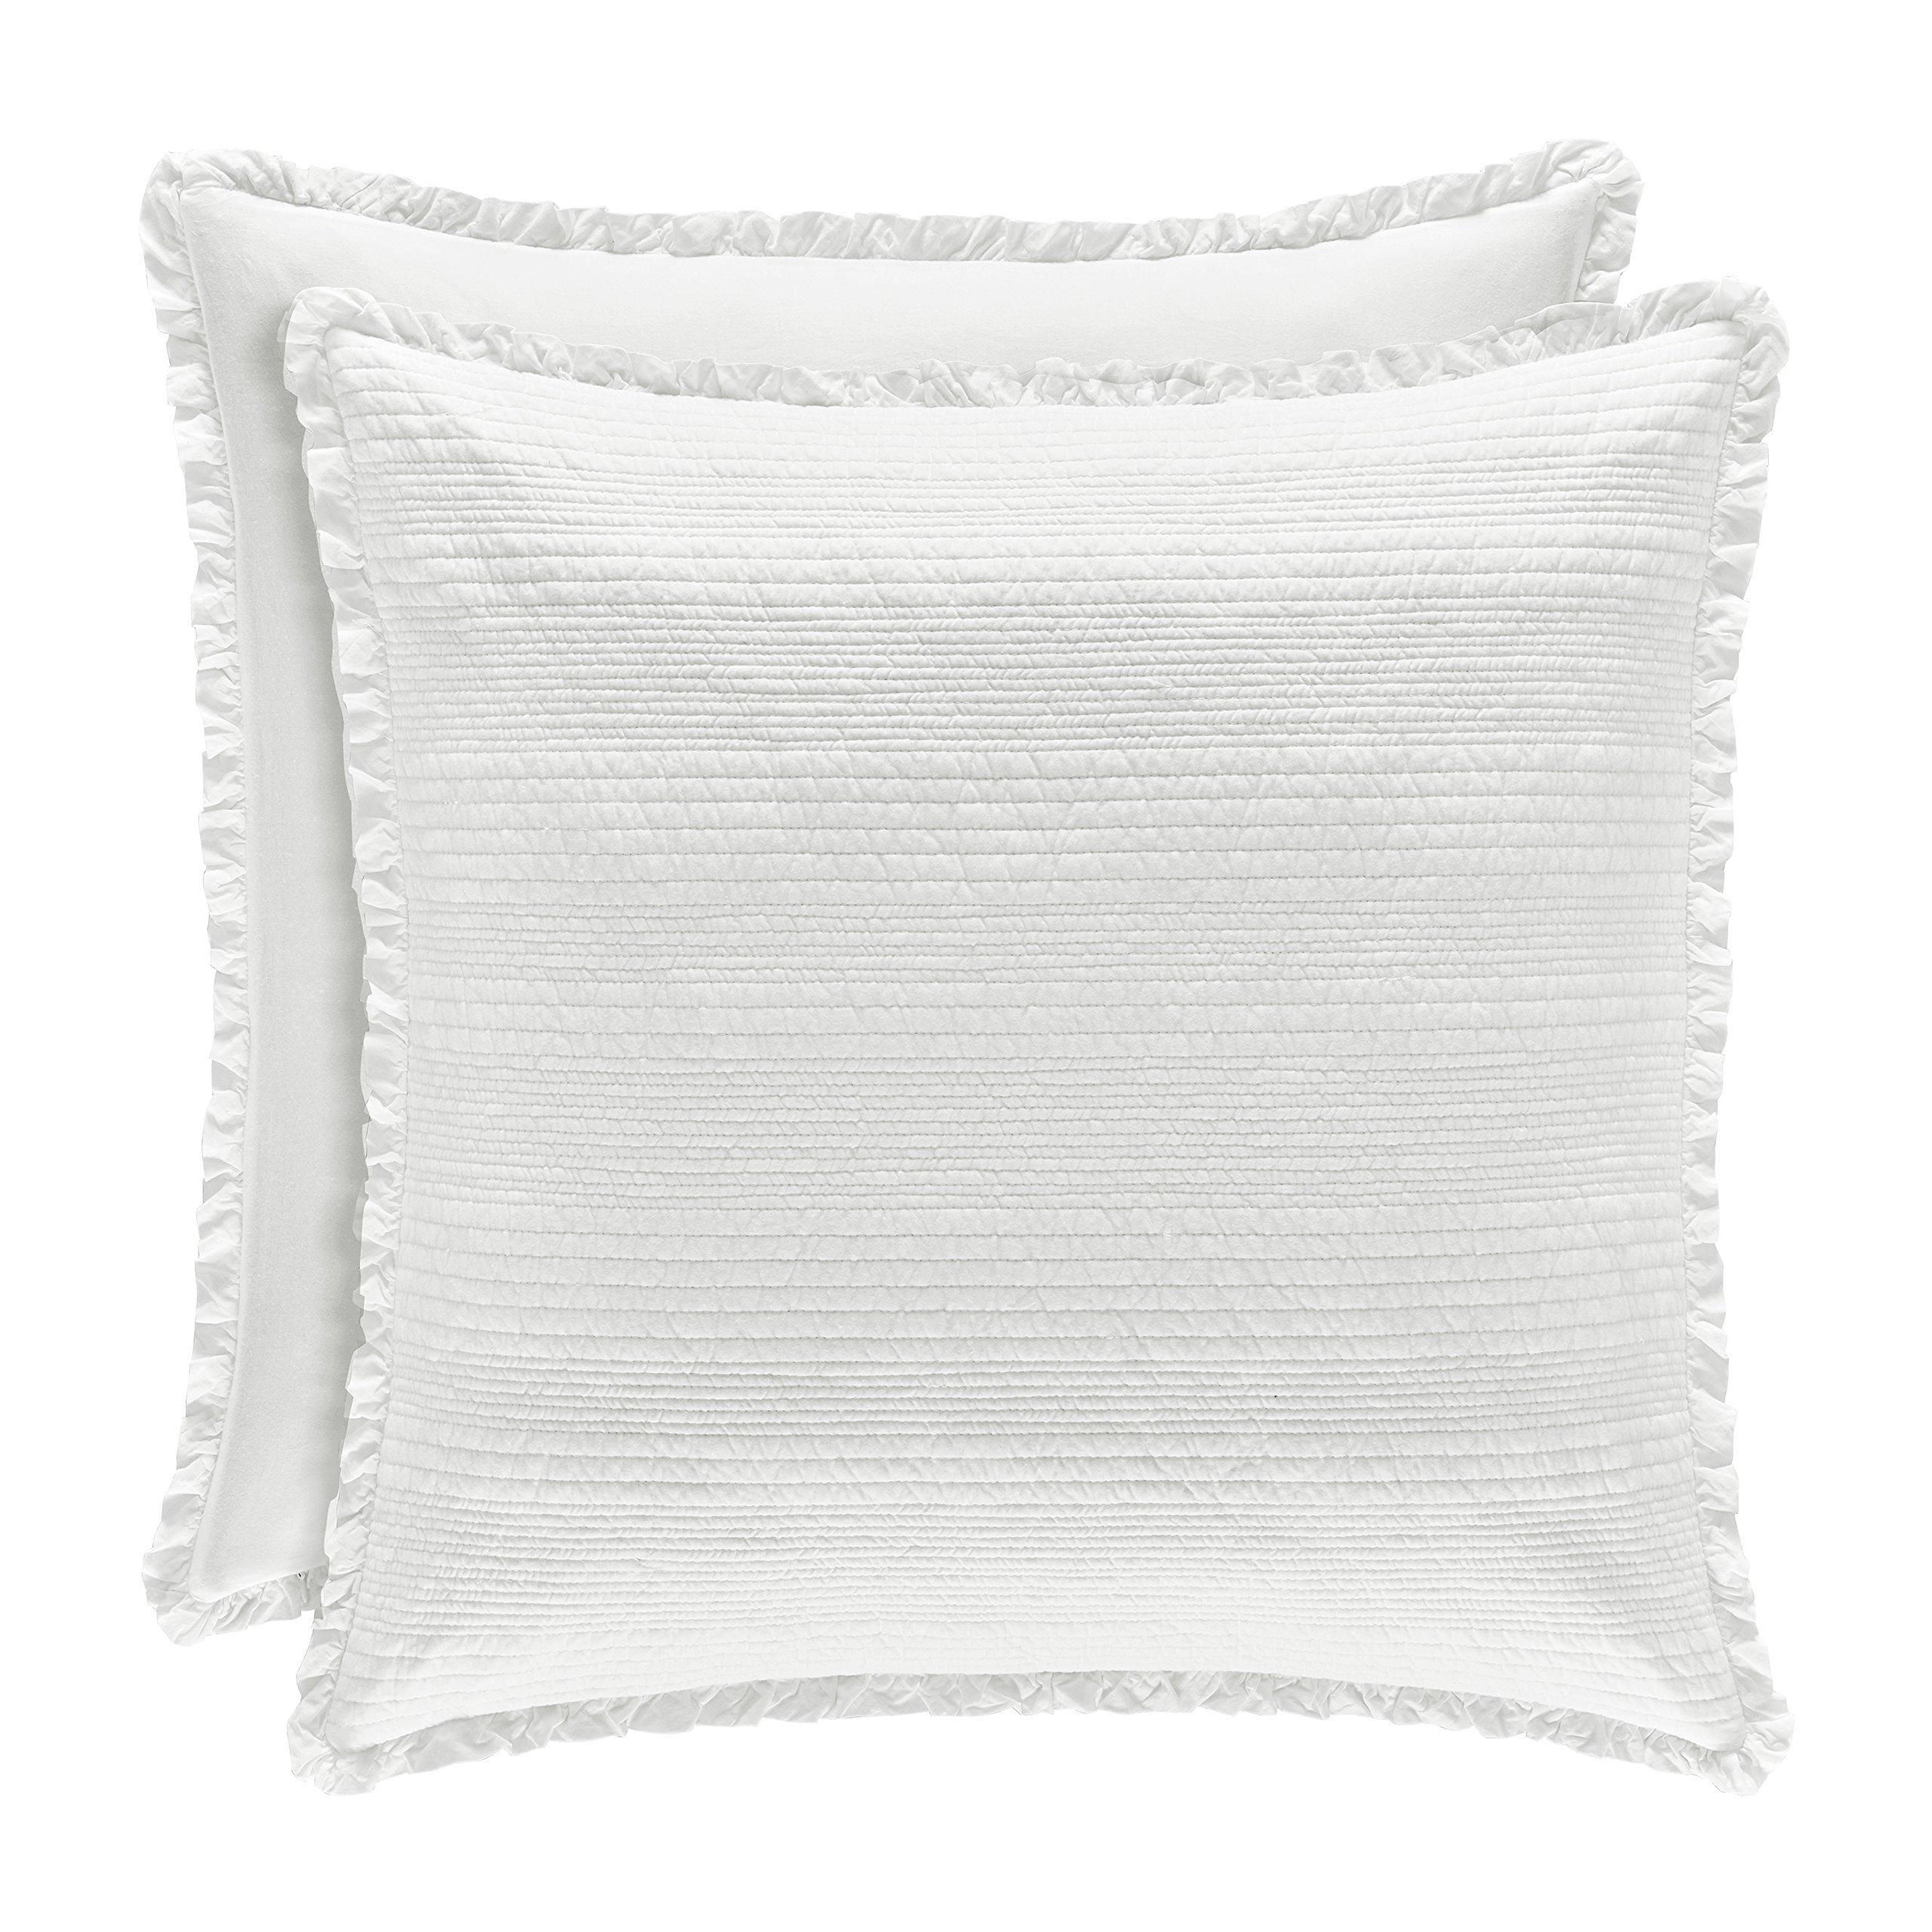 Five Queens Court Hattie Country Chic 100% Cotton Ruffle Flange Quilted Euro Sham, White